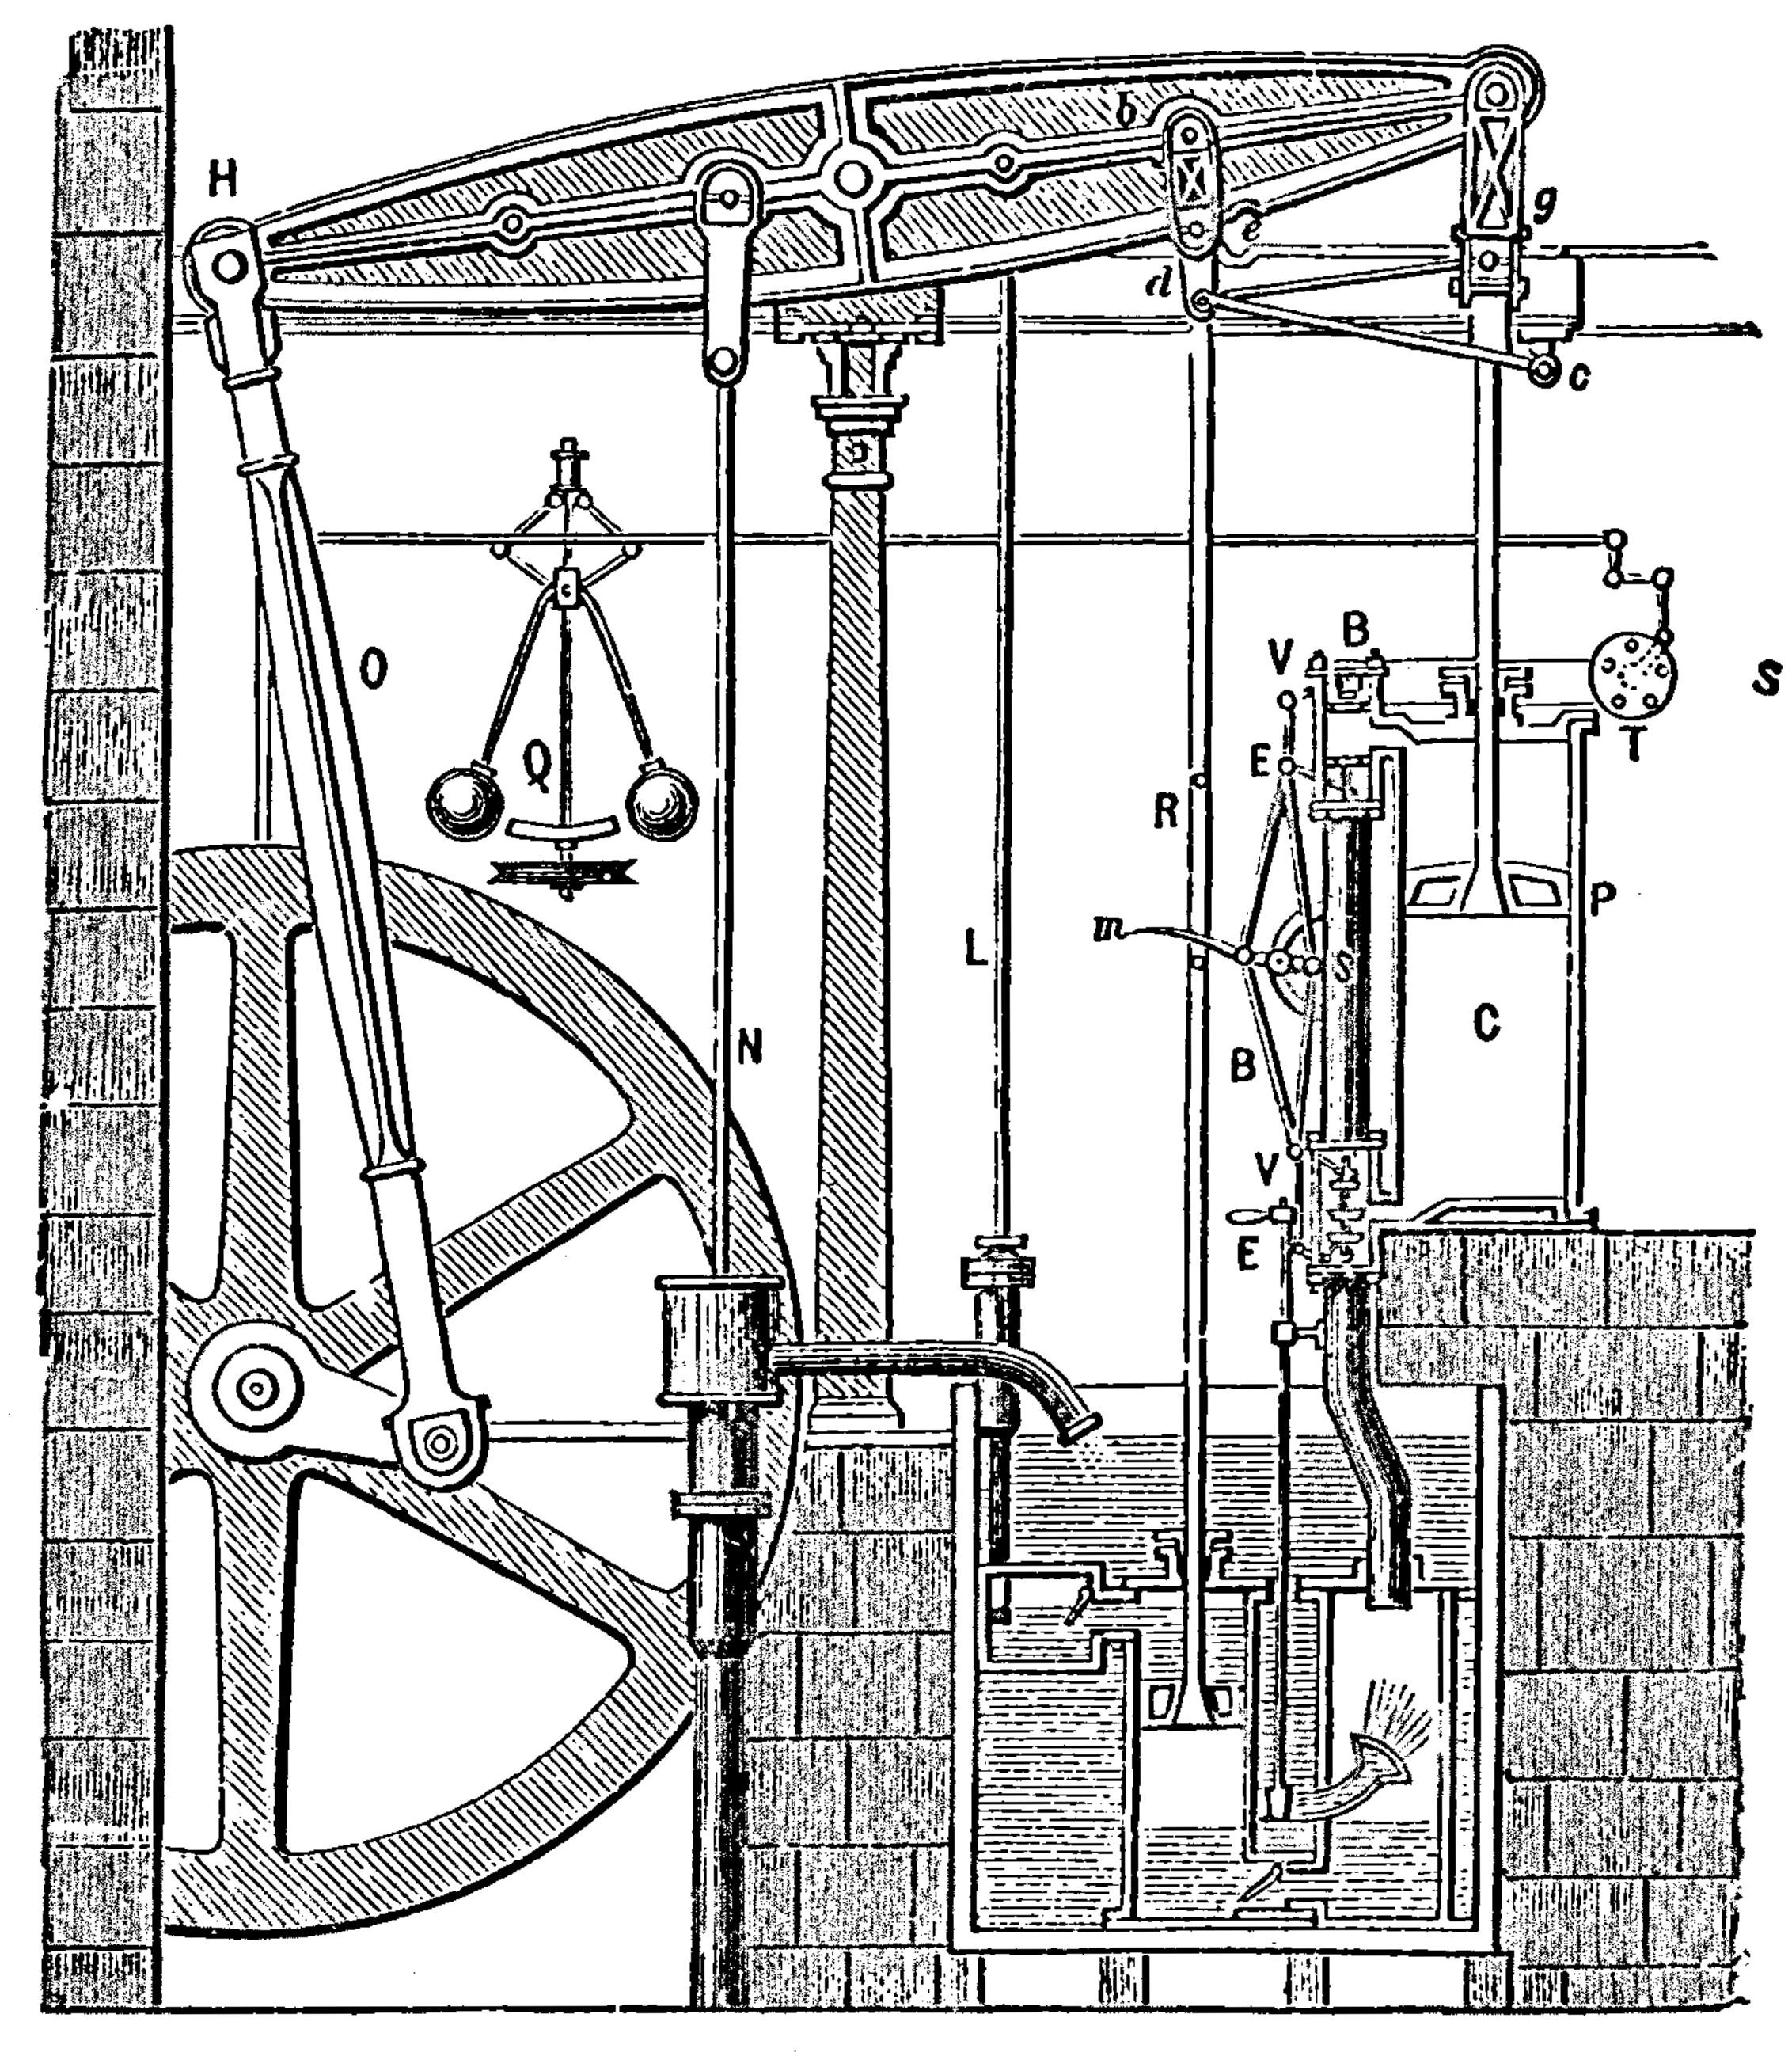 James Watt Steam Engine Diagram File Steamengine Boulton&watt 1784 Wikimedia Mons Of James Watt Steam Engine Diagram